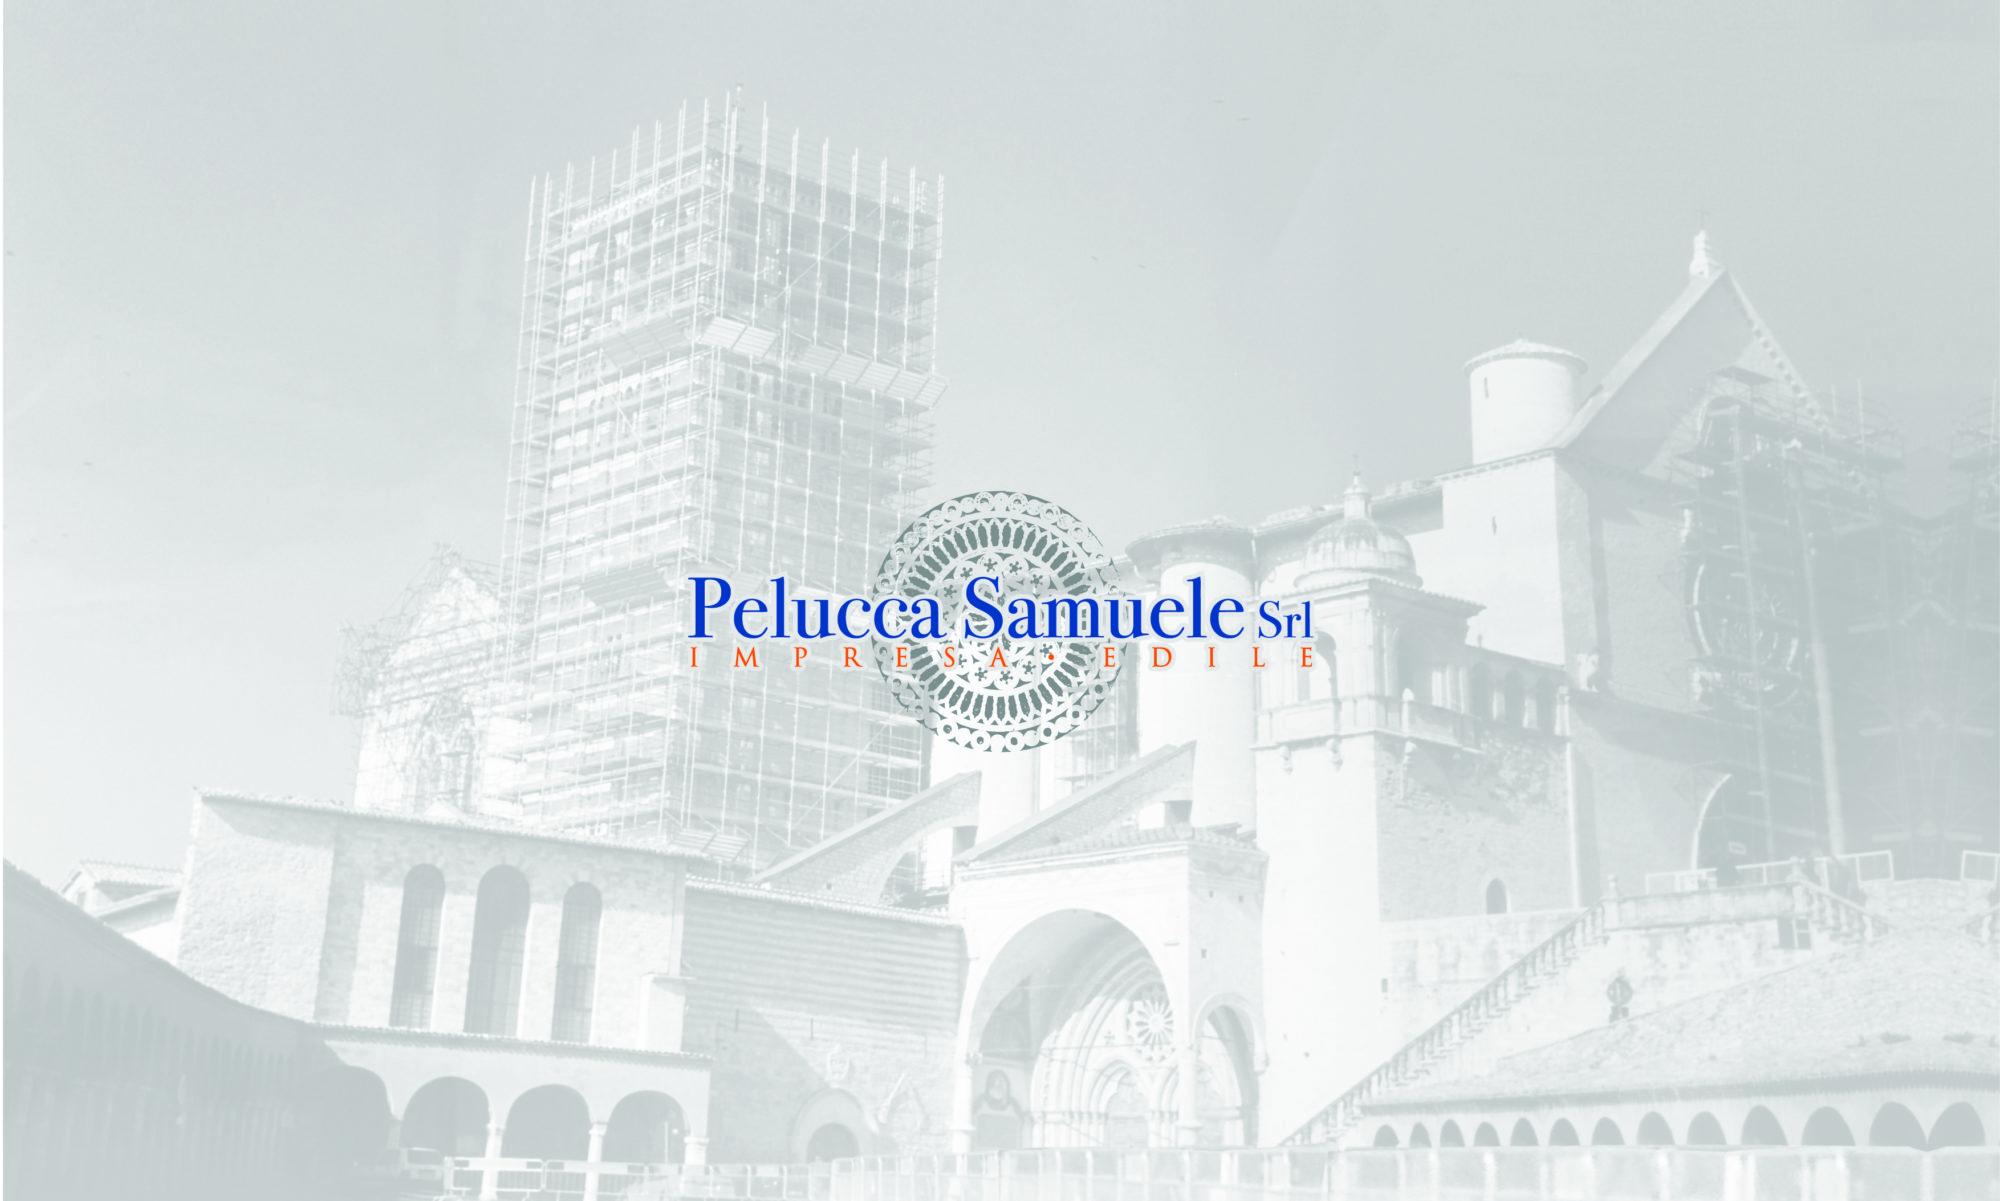 Pelucca Samuele S.r.l.